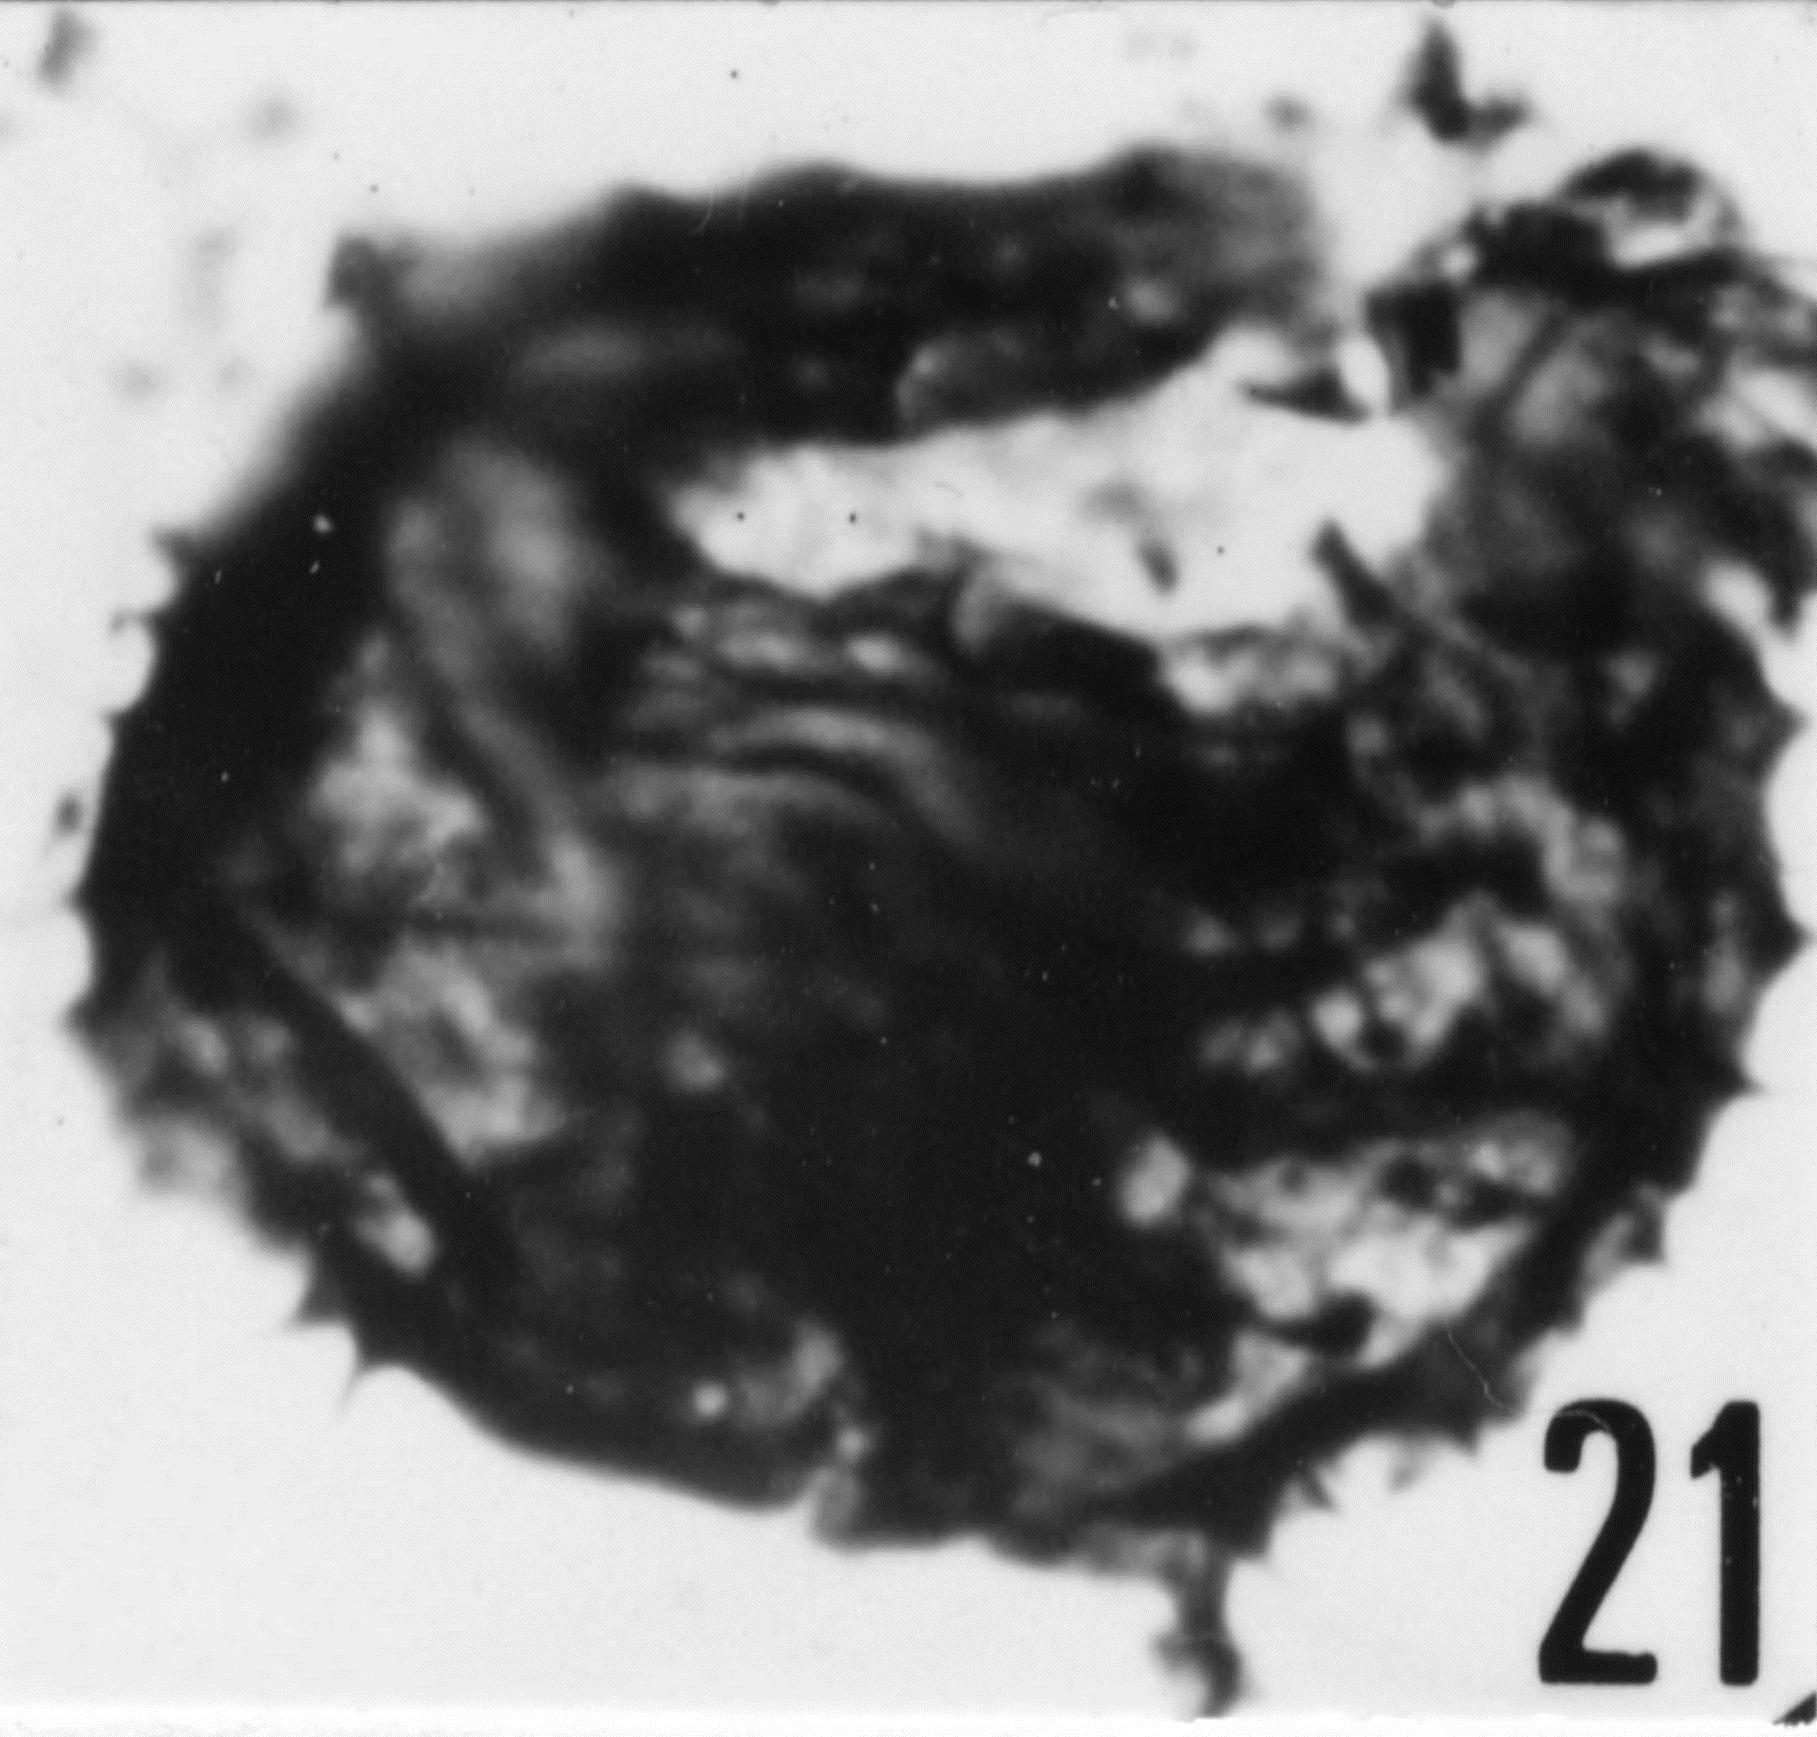 Fig. 21 - Acanthodiacrodium ubui Martin, F., 1969. Ouverture longitudinale. CHE-31. I. R. Se. N. B. N° b510.